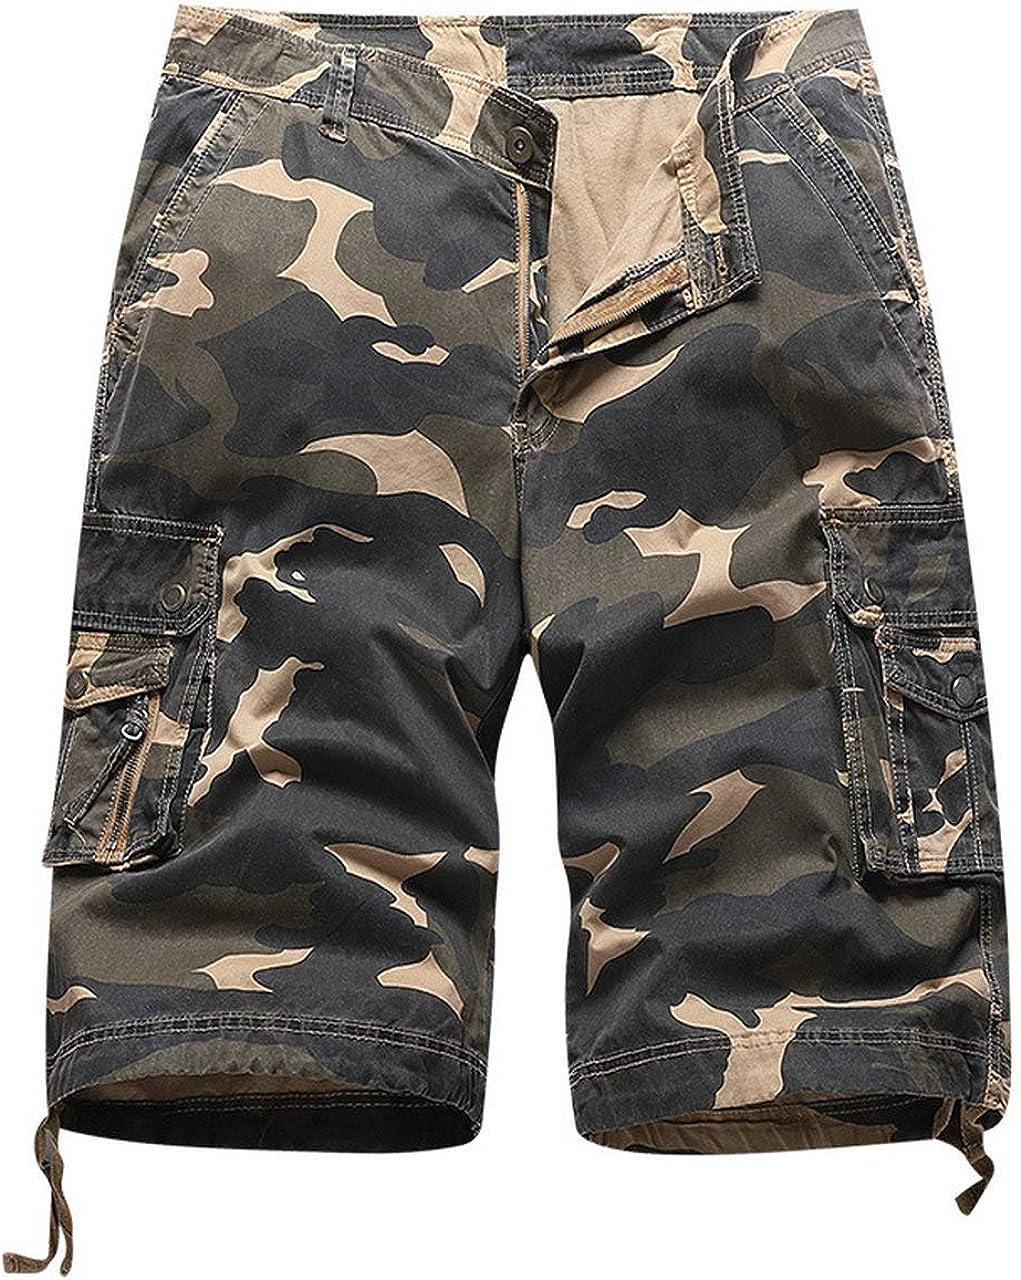 Raroauf Men's Casual Camo Multi-Pockets Military Cargo Shorts